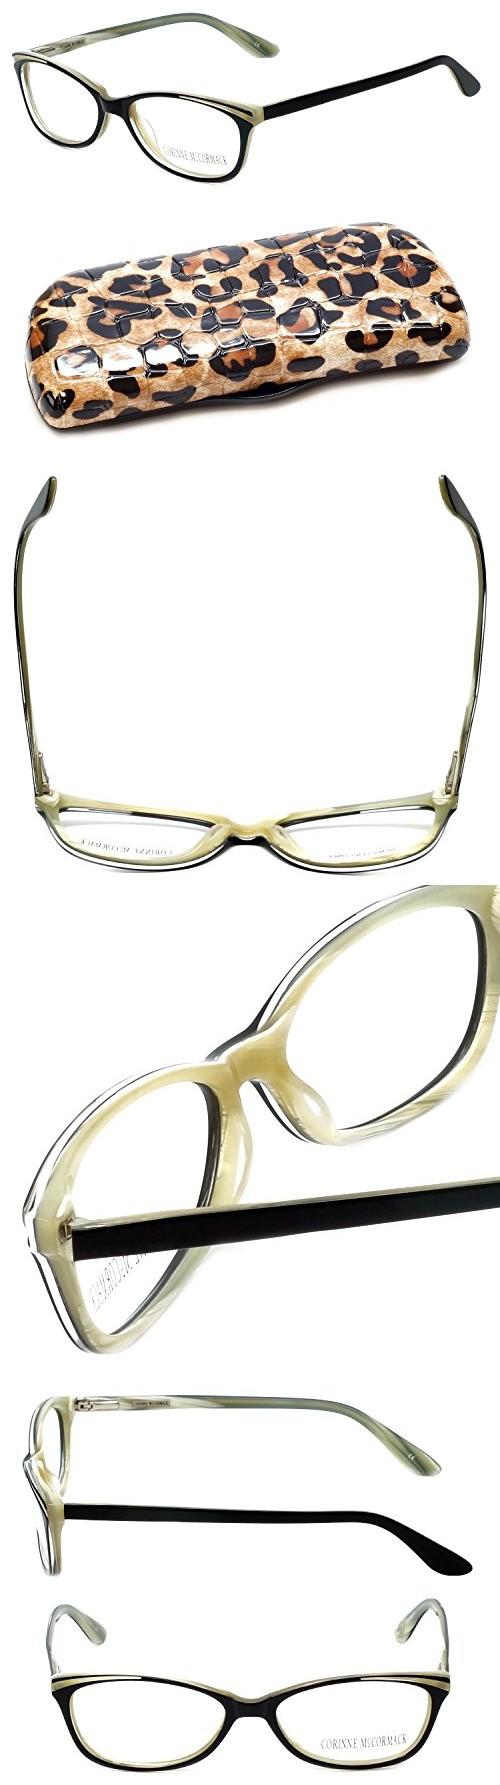 3ec33acc5d23 Corinne McCormack Designer Reading Glasses West End in Black +4.00 ...